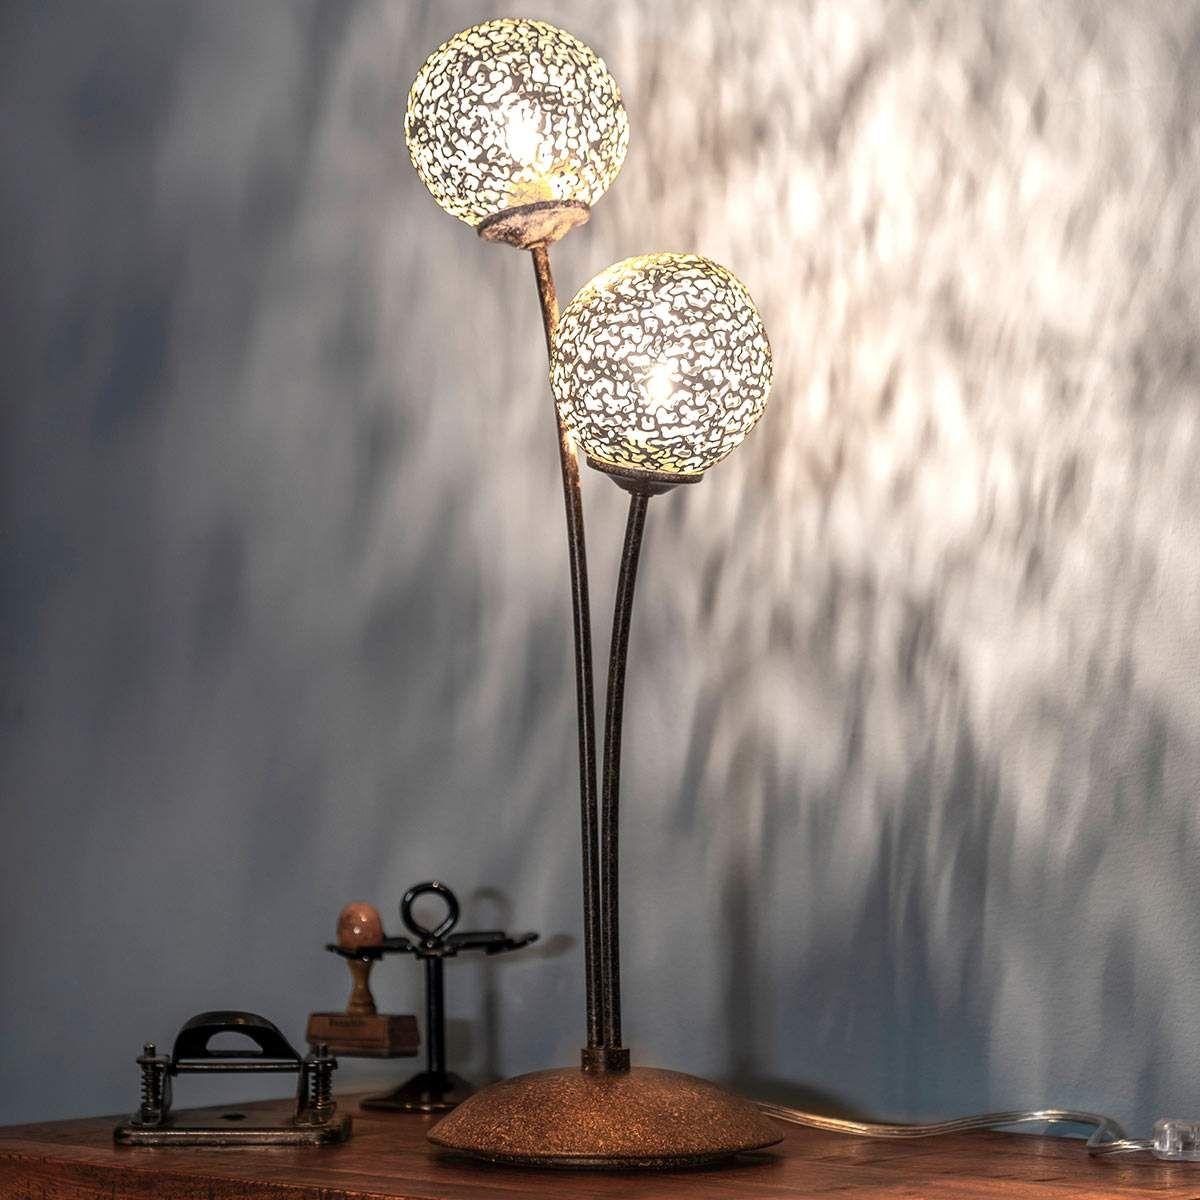 Lampe à poser Greta à deux lampesLampe à poser   Paul Neuhaus